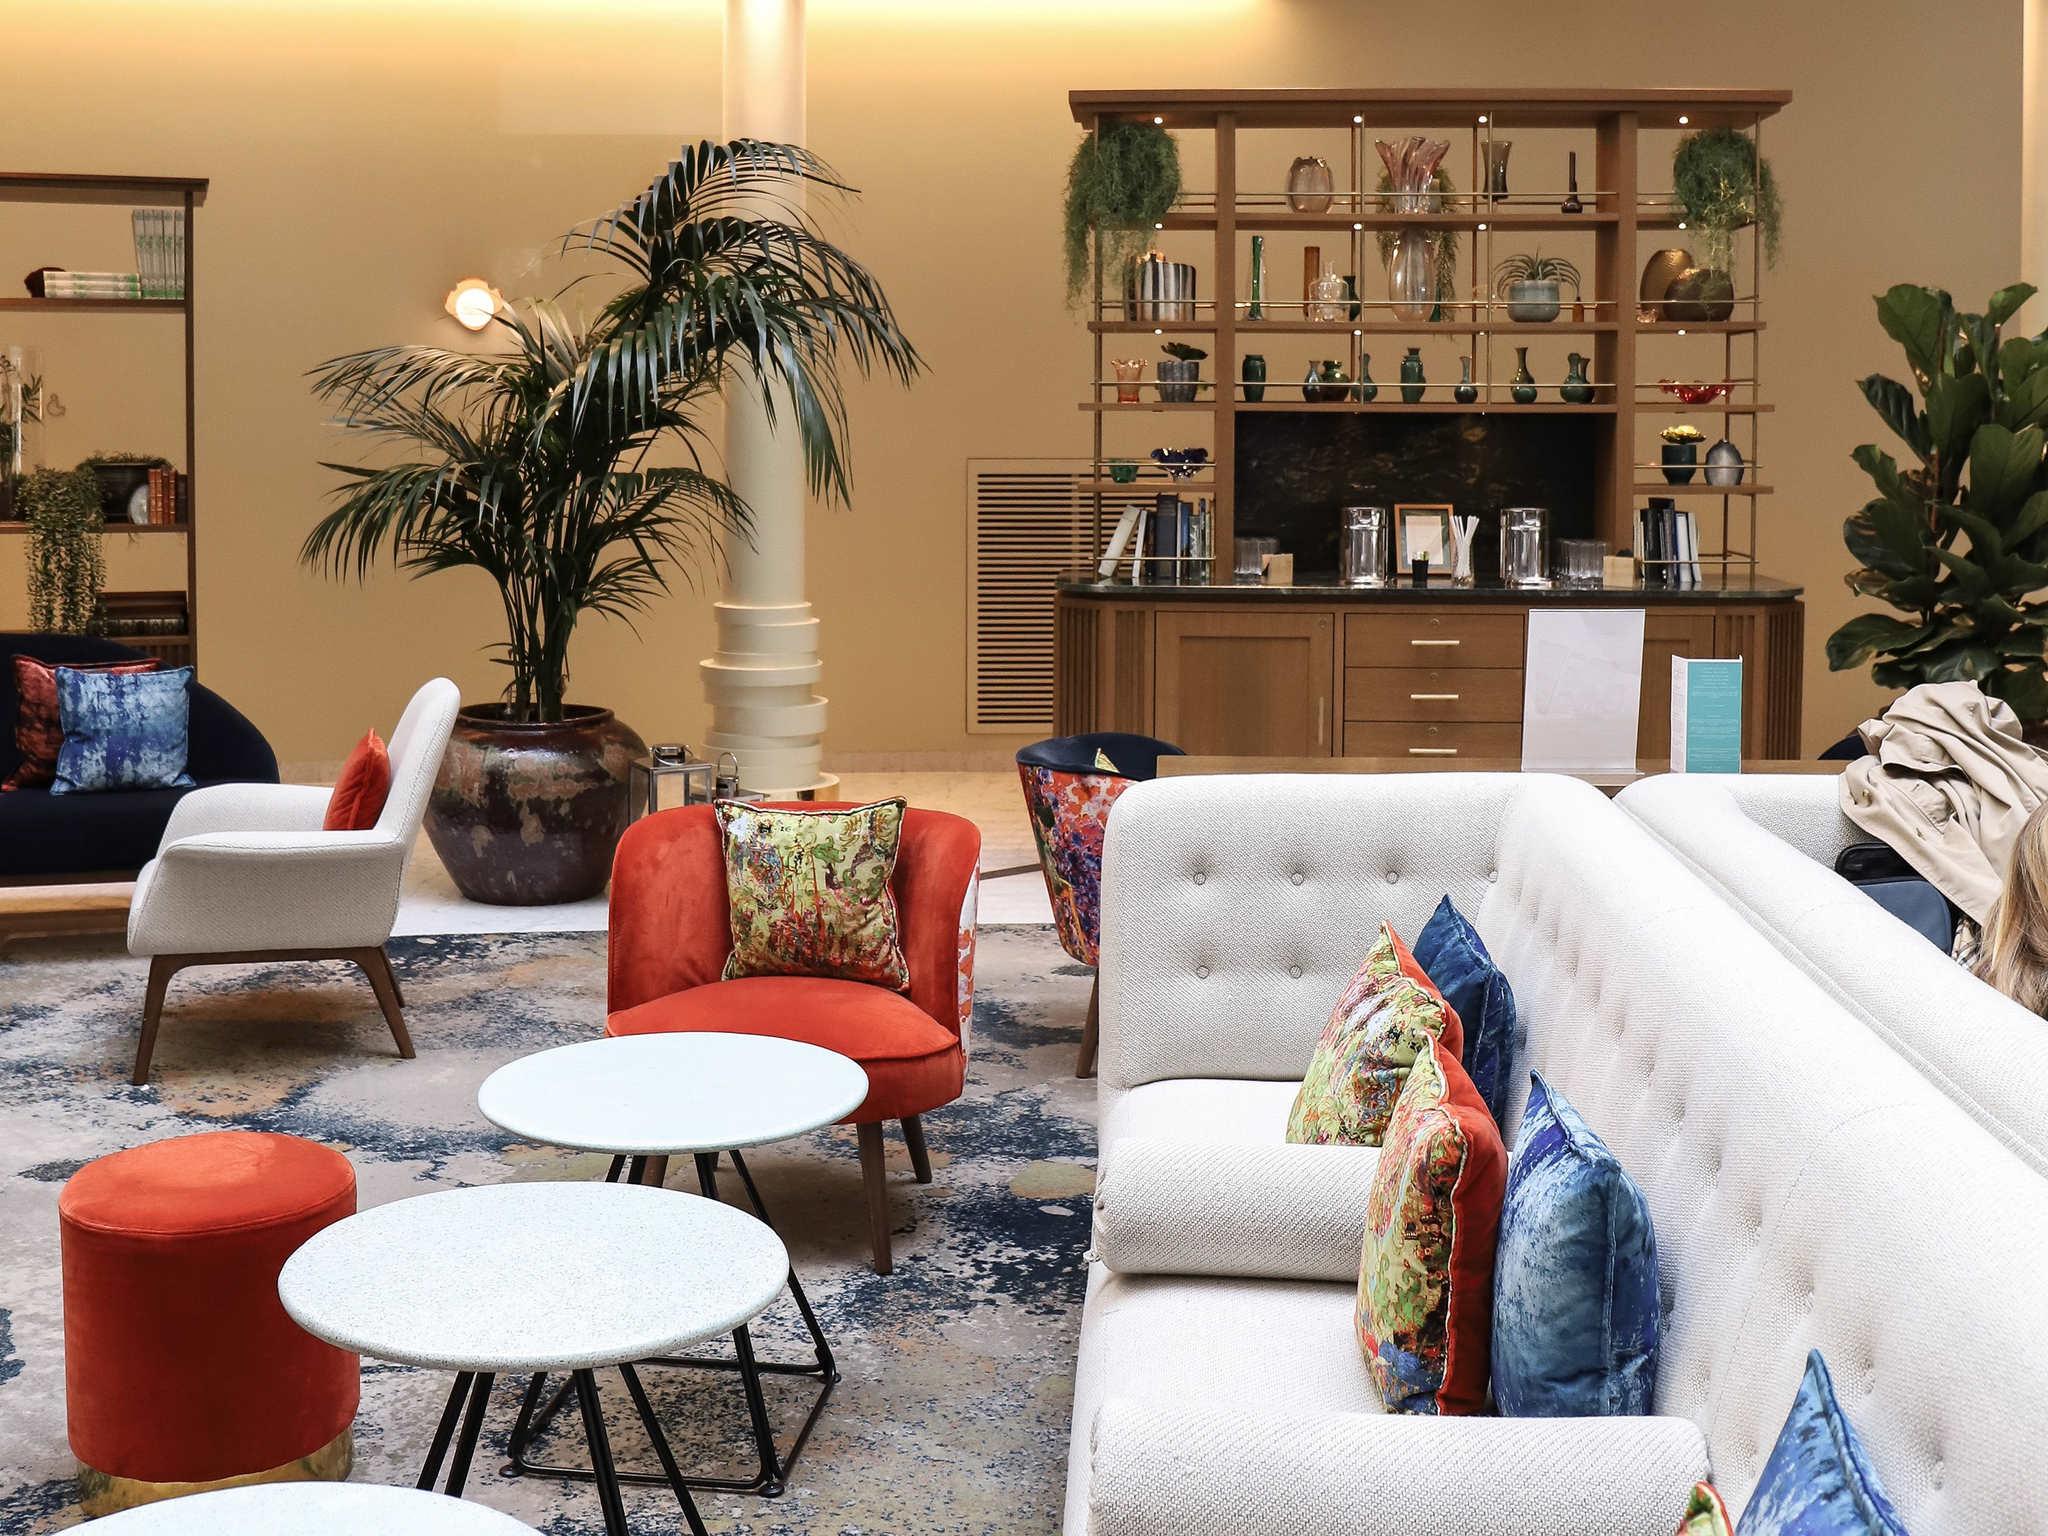 Hôtel - Sofitel Brussels Europe